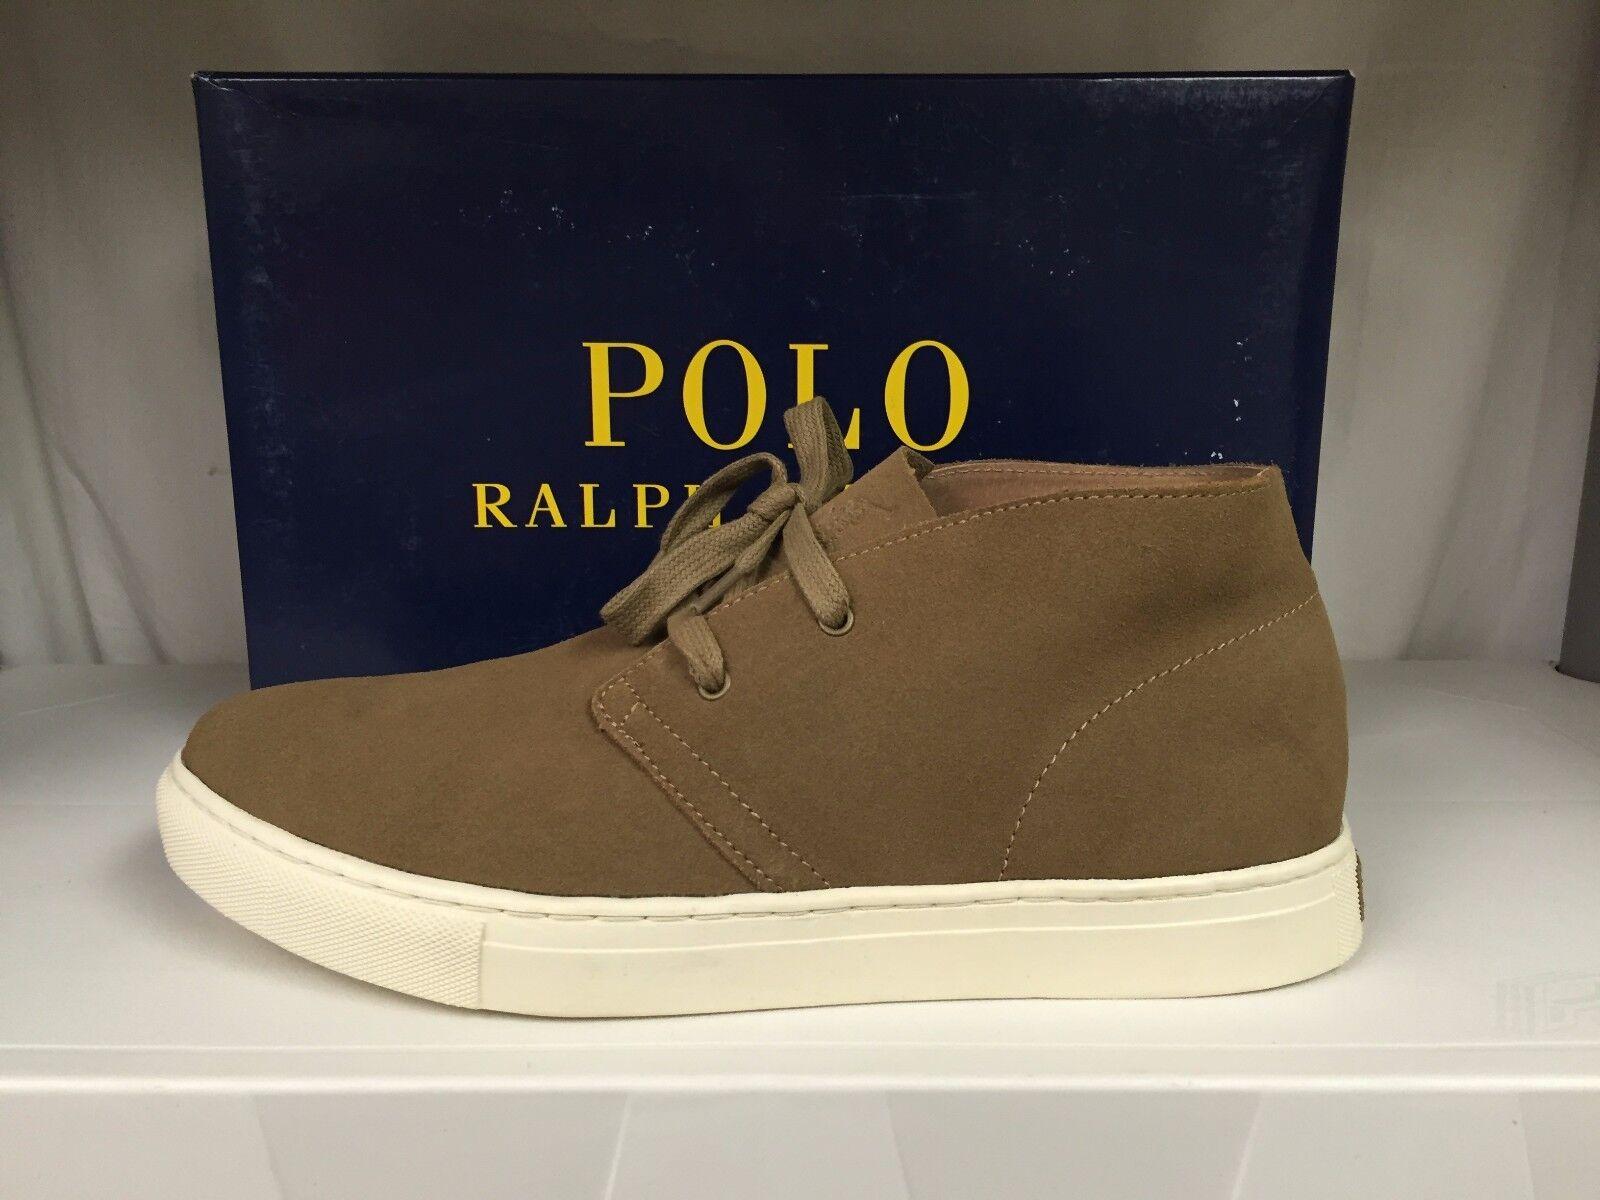 Polo Ralph Lauren Joplin Chukka Men's Suede Fashion Sneakers High Top Trainers